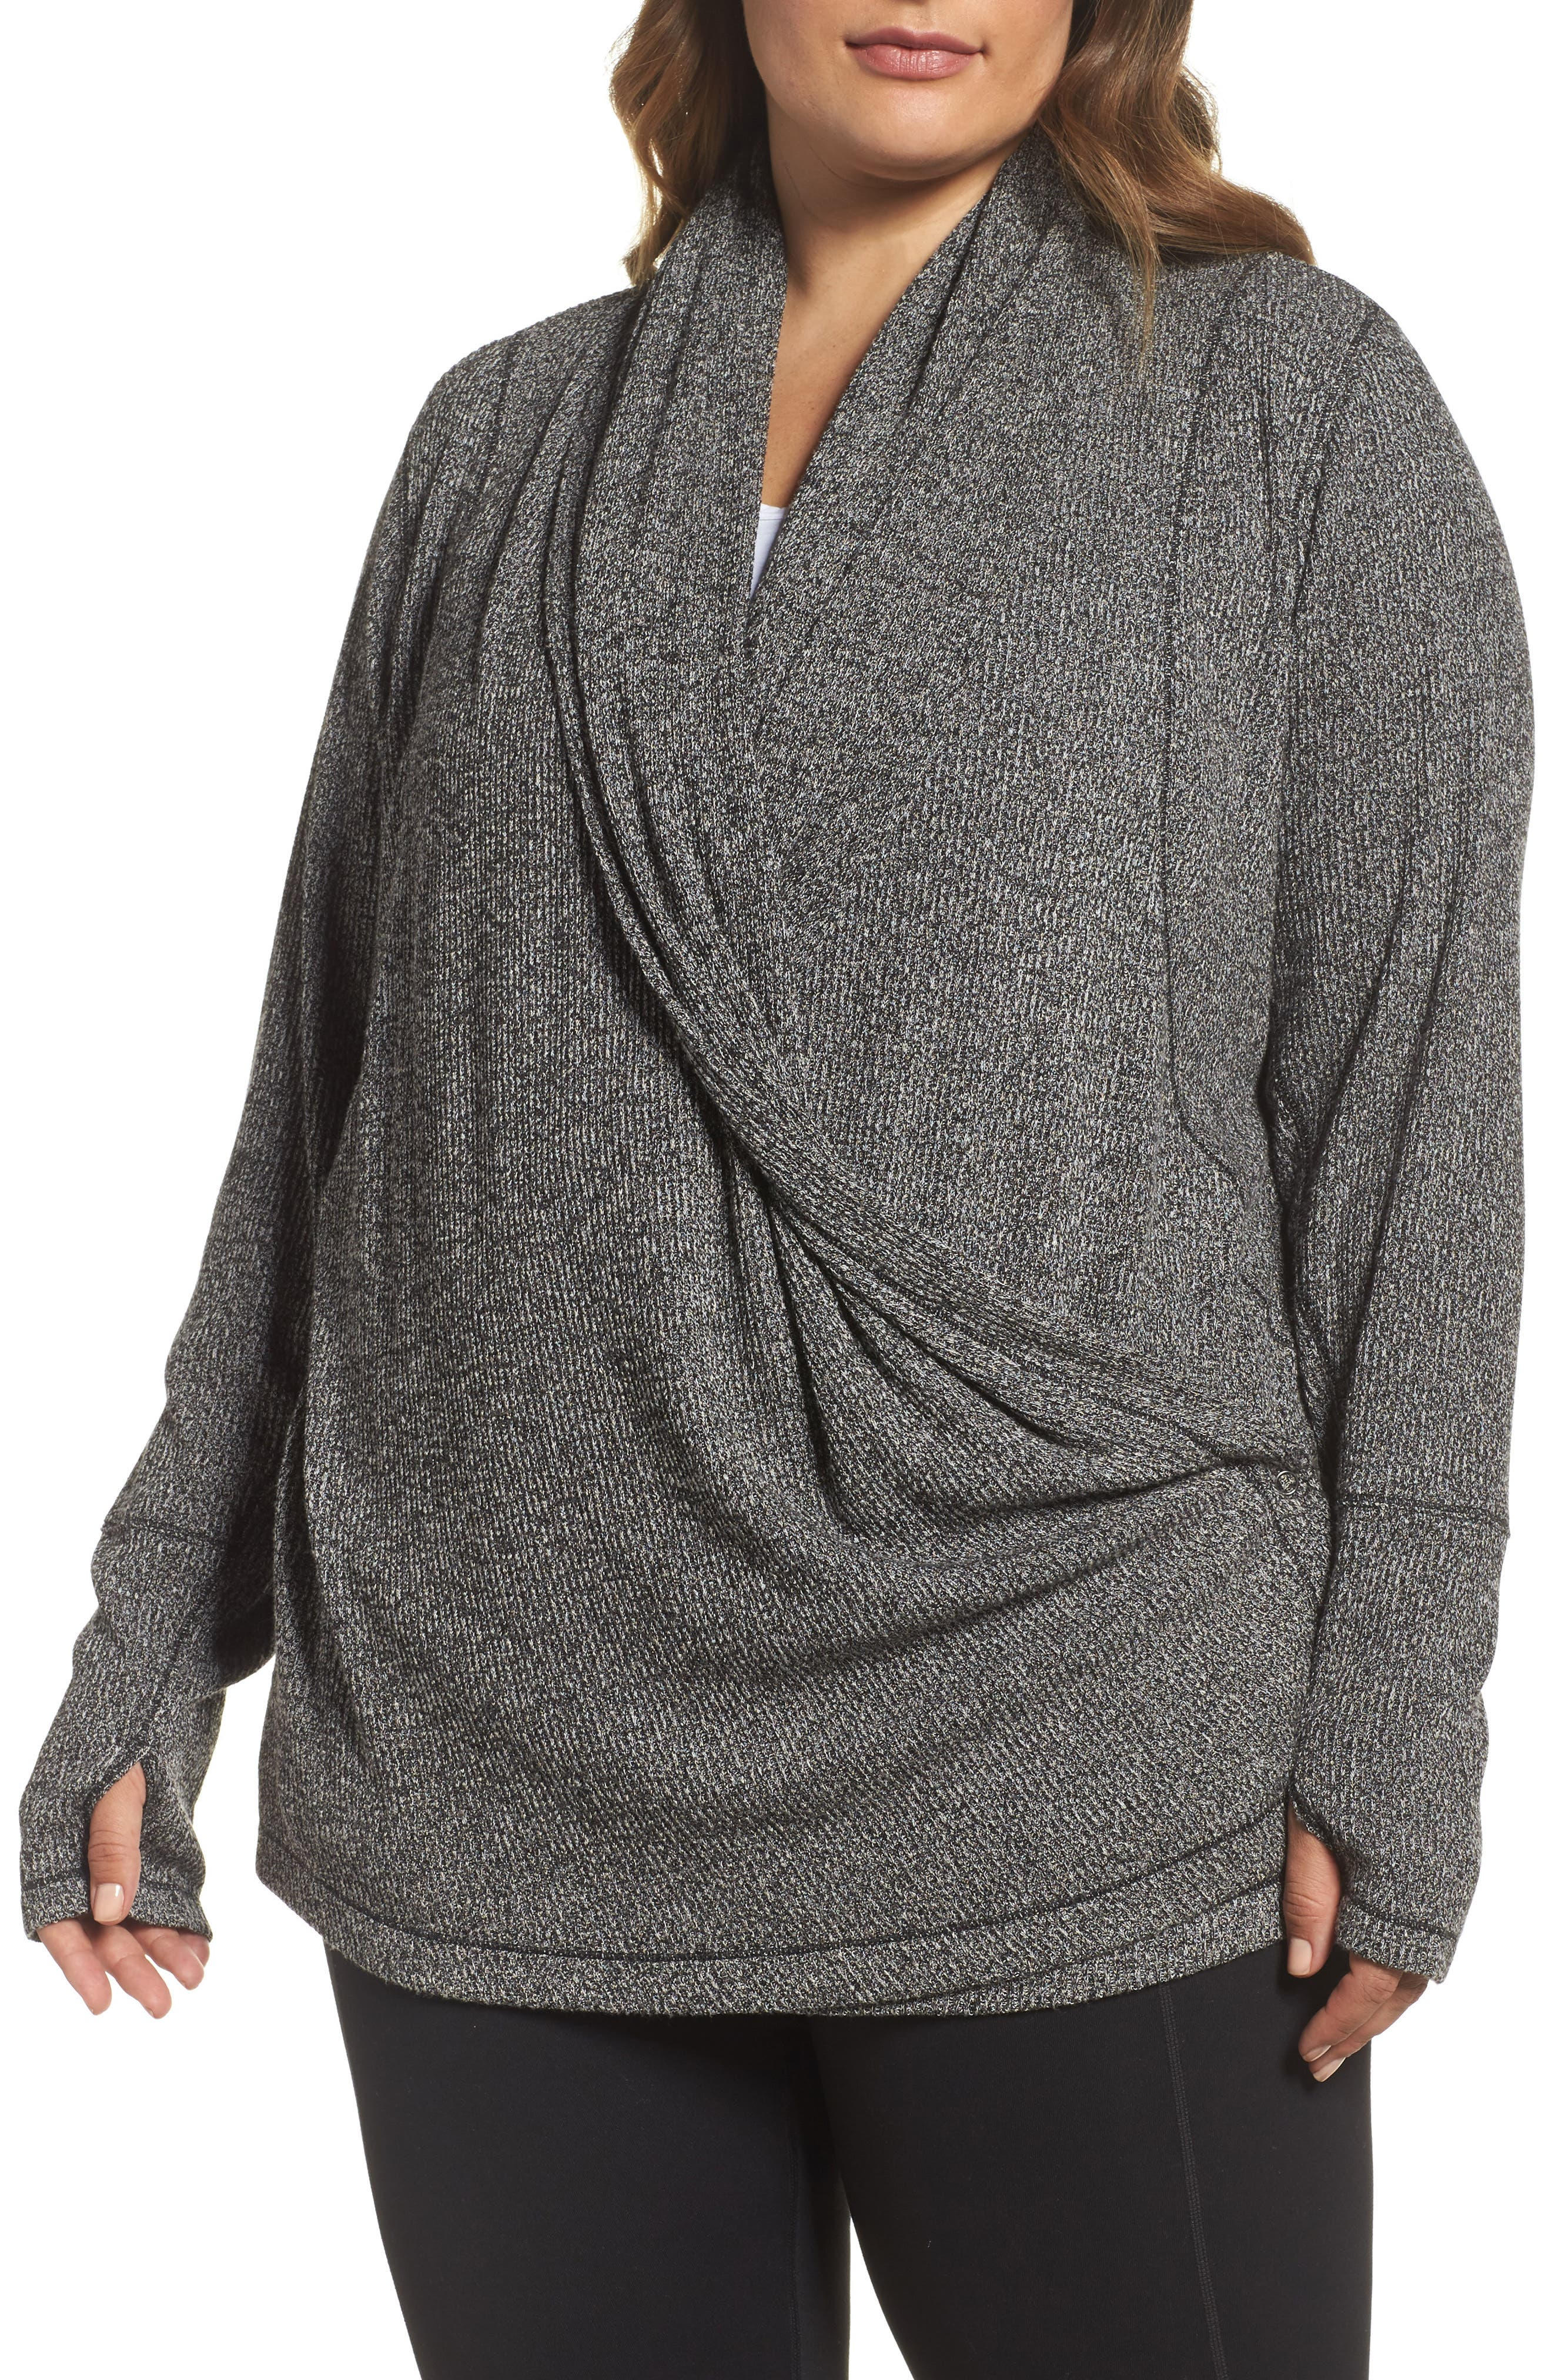 Alternate Image 1 Selected - Zella Enlighten Me Ribbed Cardigan (Plus Size)